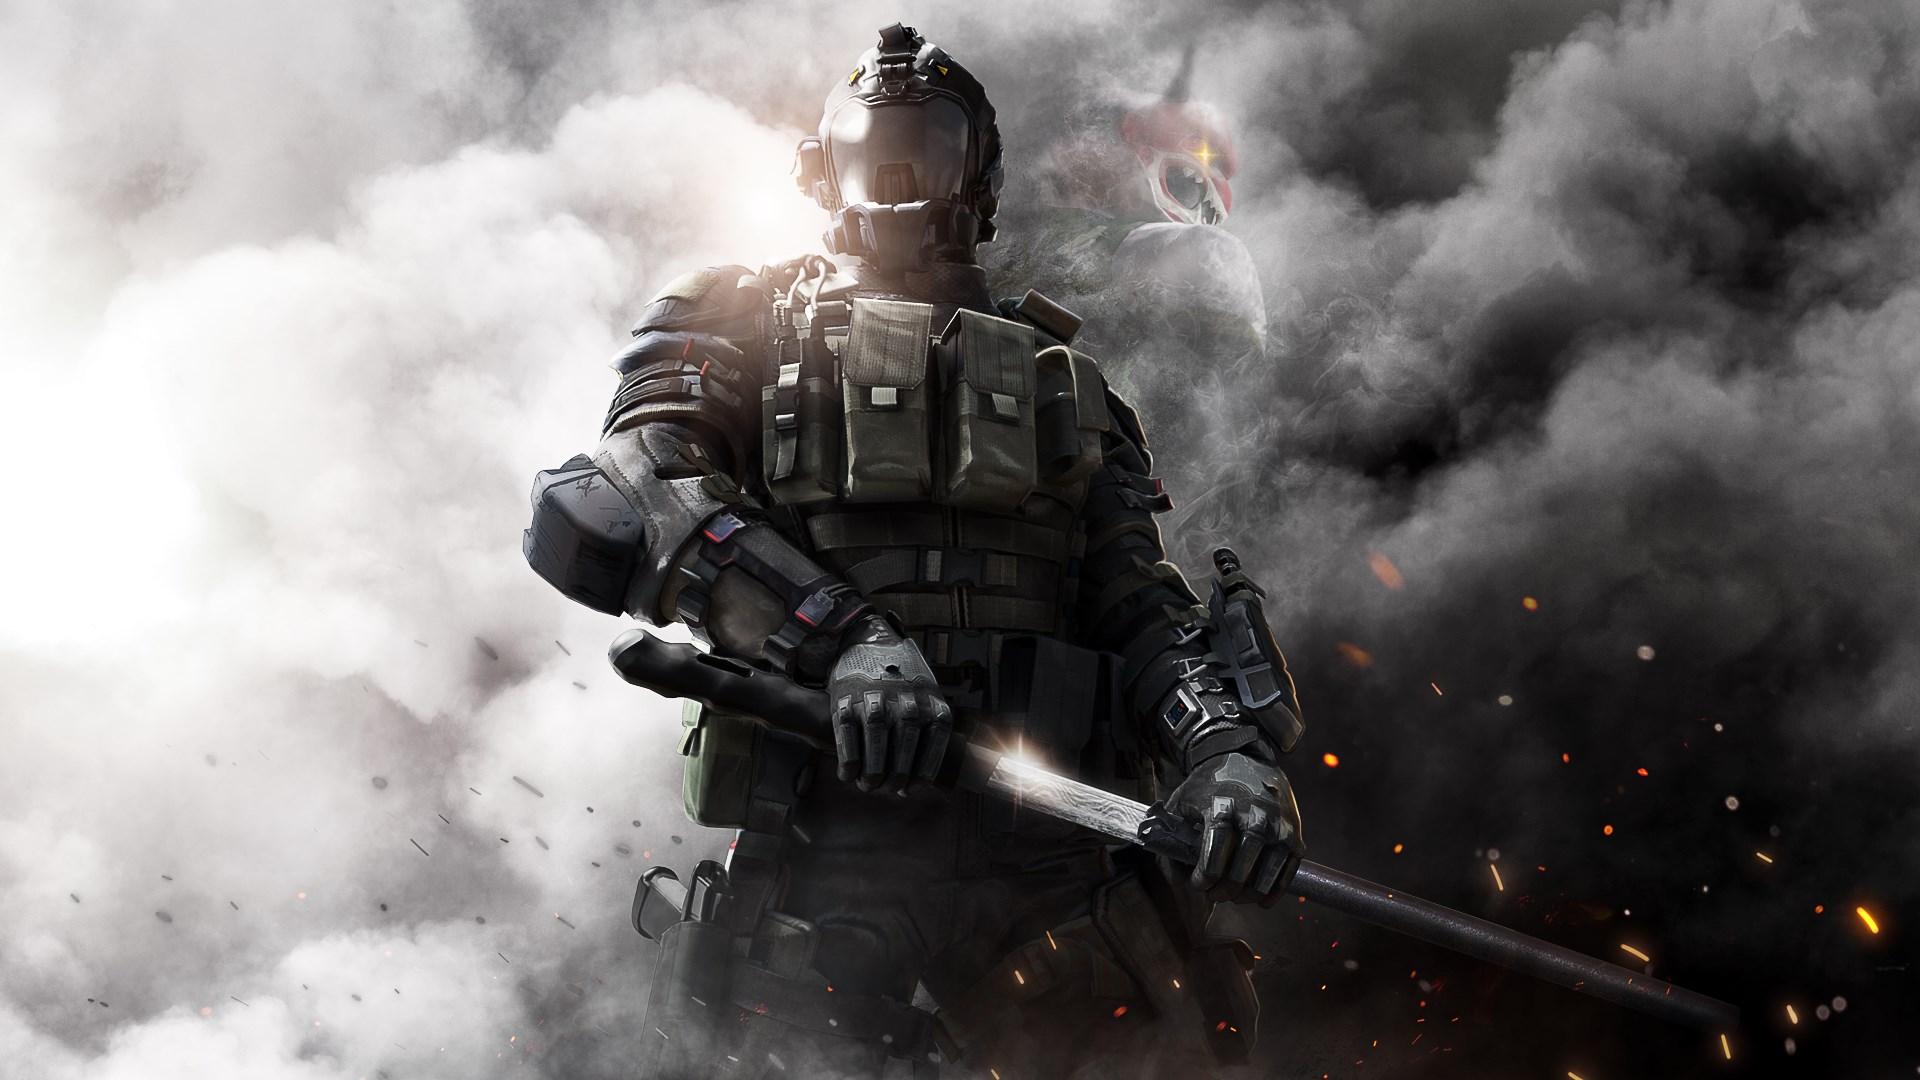 Buy Call of Duty®: Black Ops 4 - Operation Spectre Rising MP ... Call Of Duty Black Ops Maps on call of duty: black ops ii, call of duty 3, red dead redemption, call of duty: modern warfare 2, gears of war, call of duty 2, batman: arkham city, medal of honor, grand theft auto, call of duty 4: modern warfare, call of duty: world at war, halo: reach, call of duty: modern warfare 3,